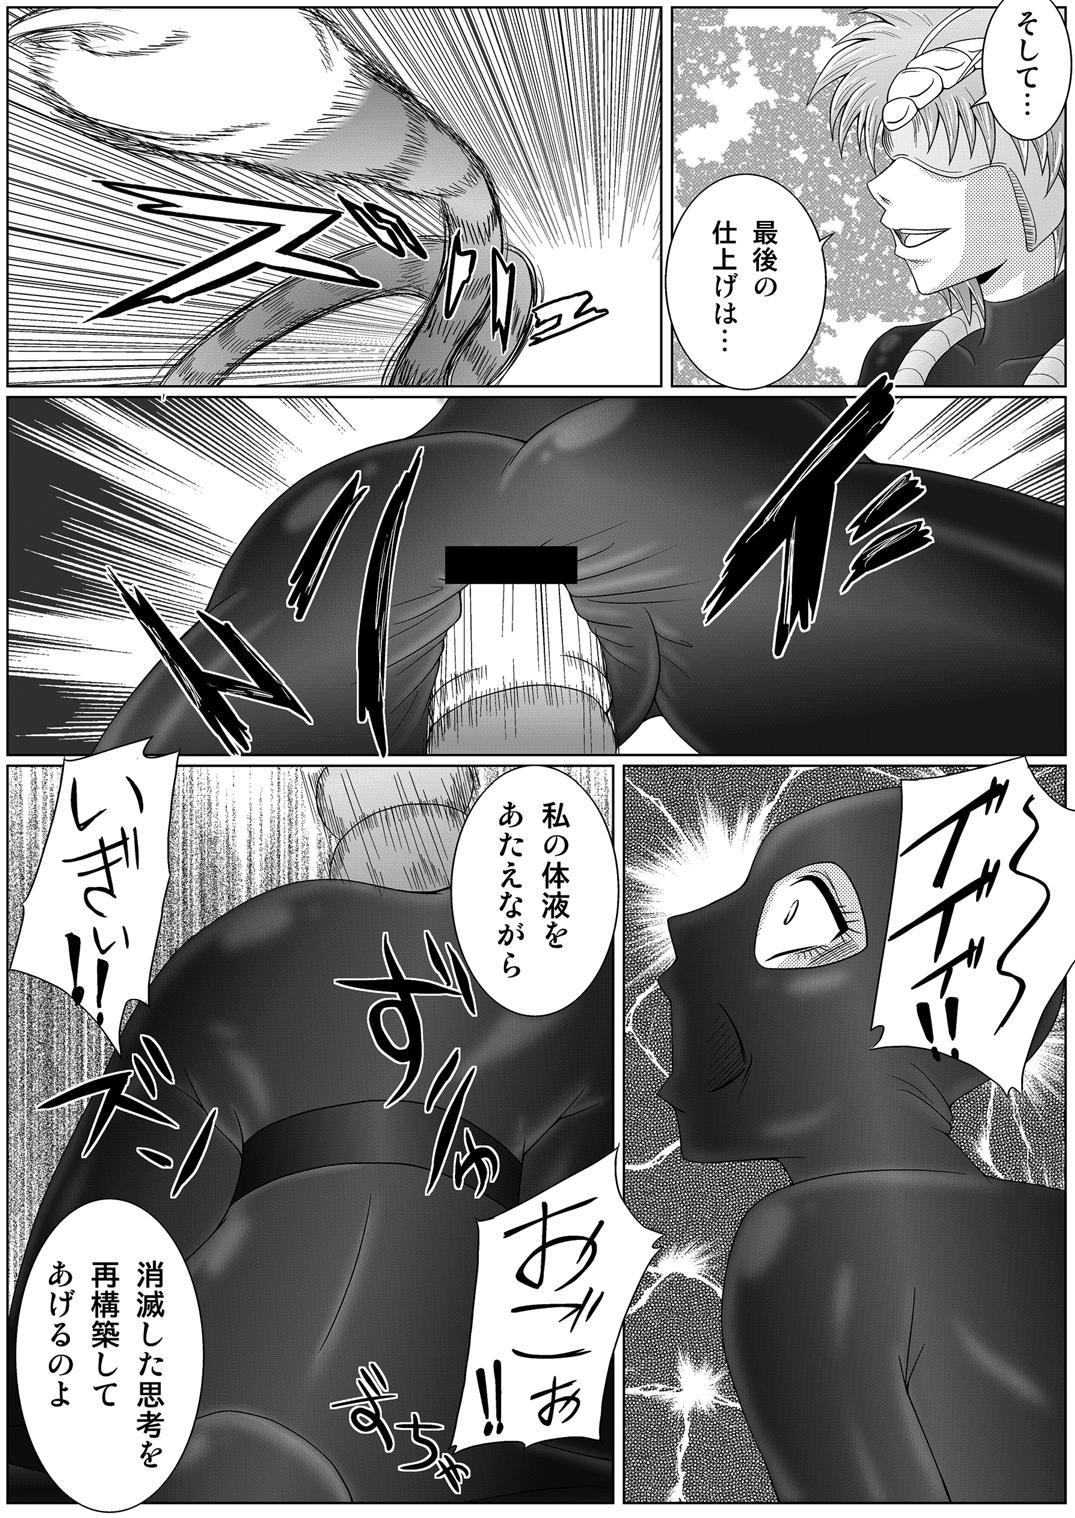 [Macxe's (monmon)] Tokubousentai Dinaranger ~Heroine Kairaku Sennou Keikaku~ Vol.01/02/03 (Renkaban) [Digital] 28